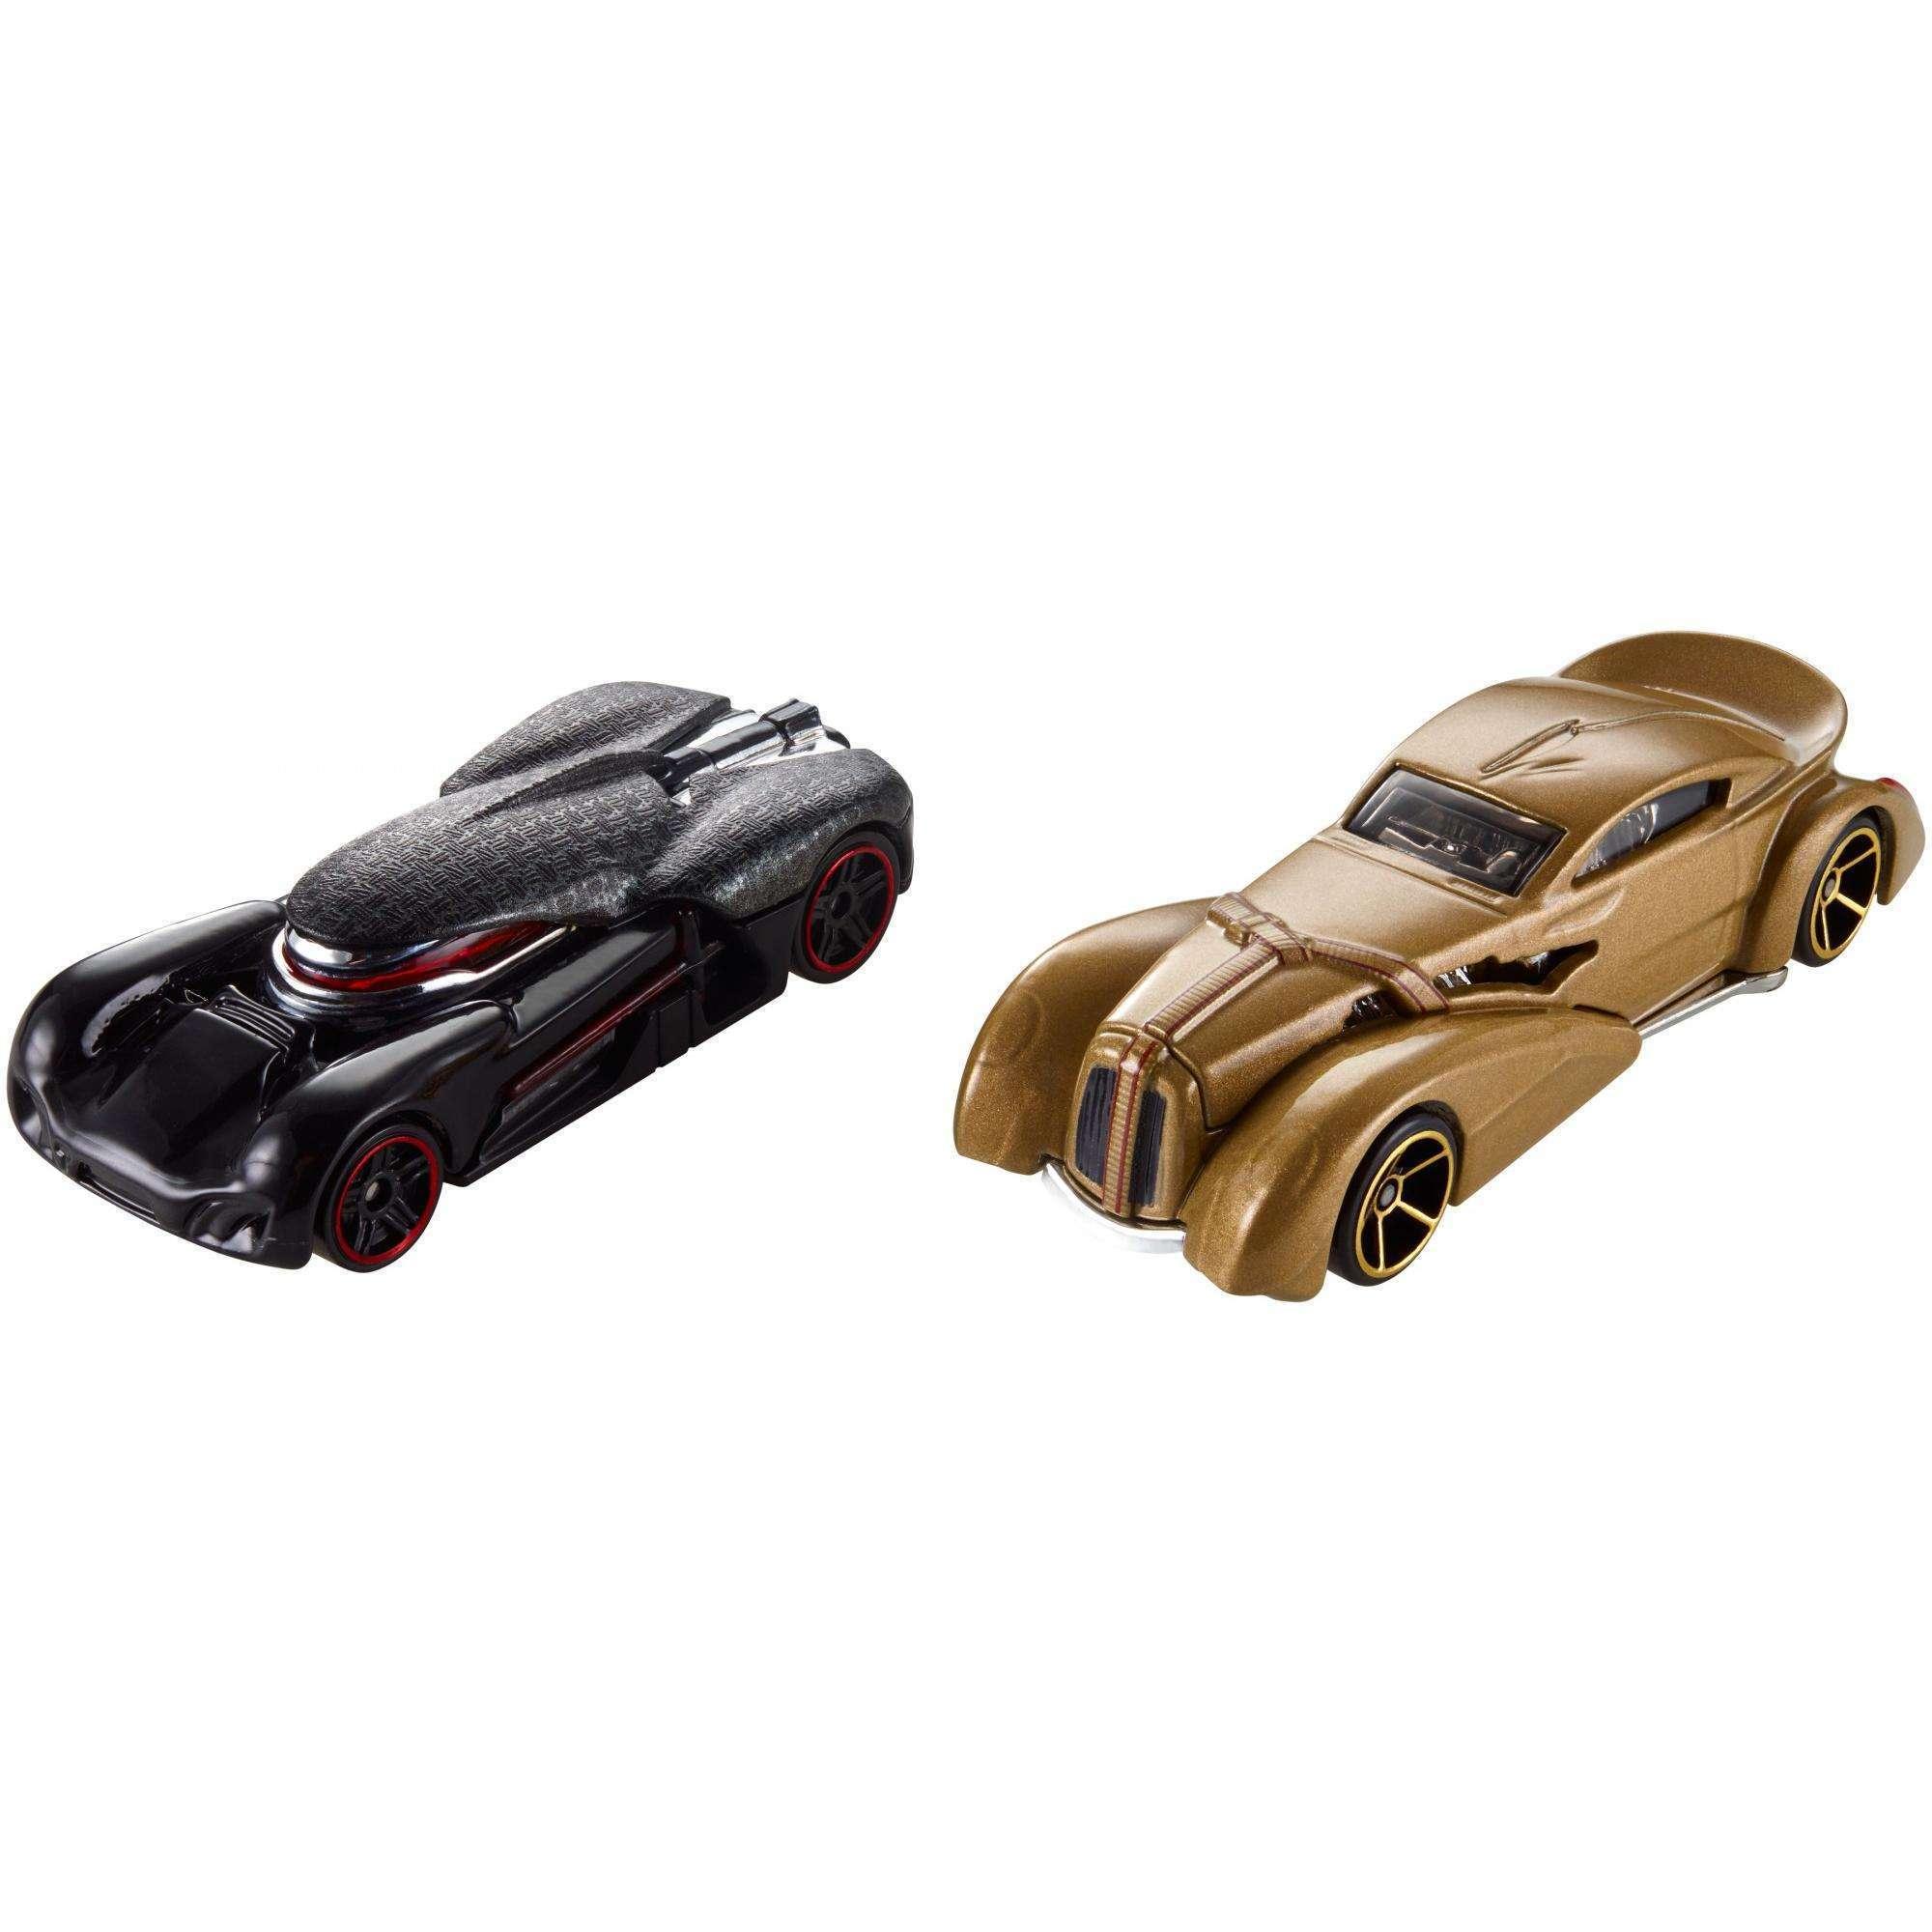 TLJ HW Snoke & Kylo Ren Character Car 2-pack 3